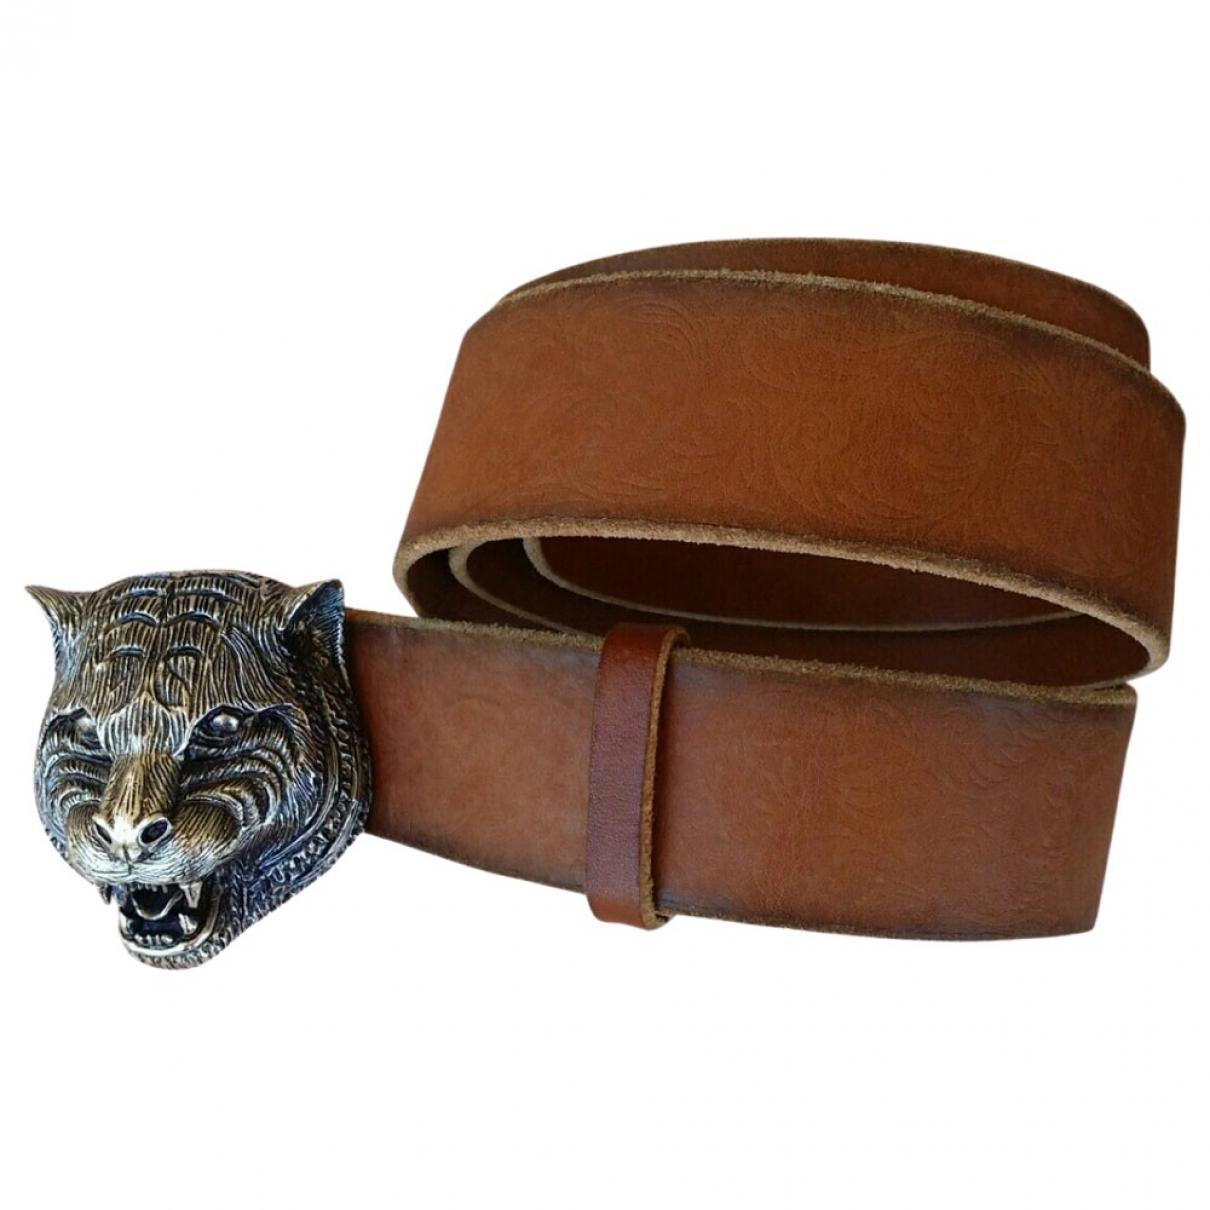 Gucci Feline Buckle Brown Leather belt for Women 90 cm